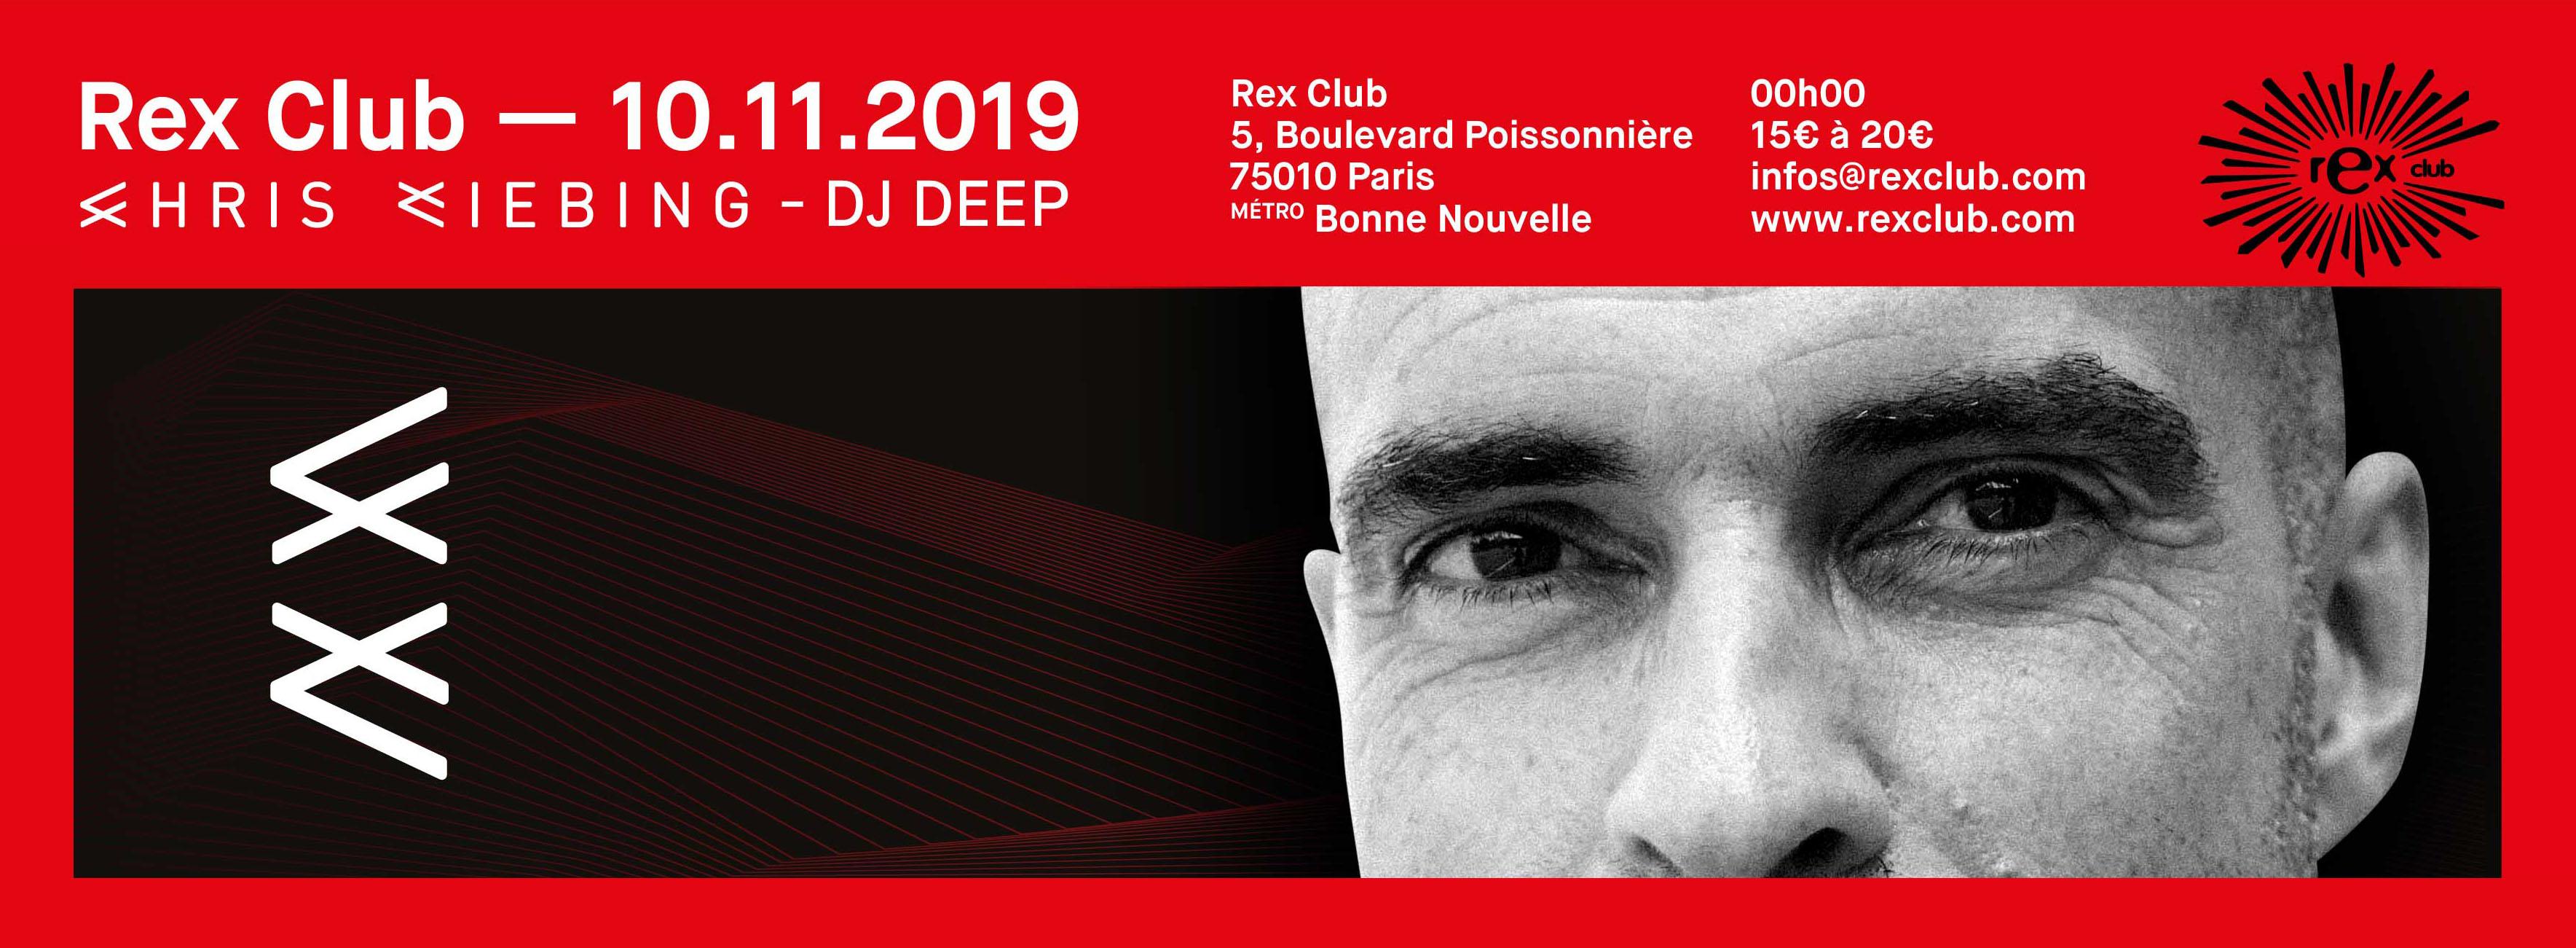 Rex Club presente: Chris Liebing, DJ Deep